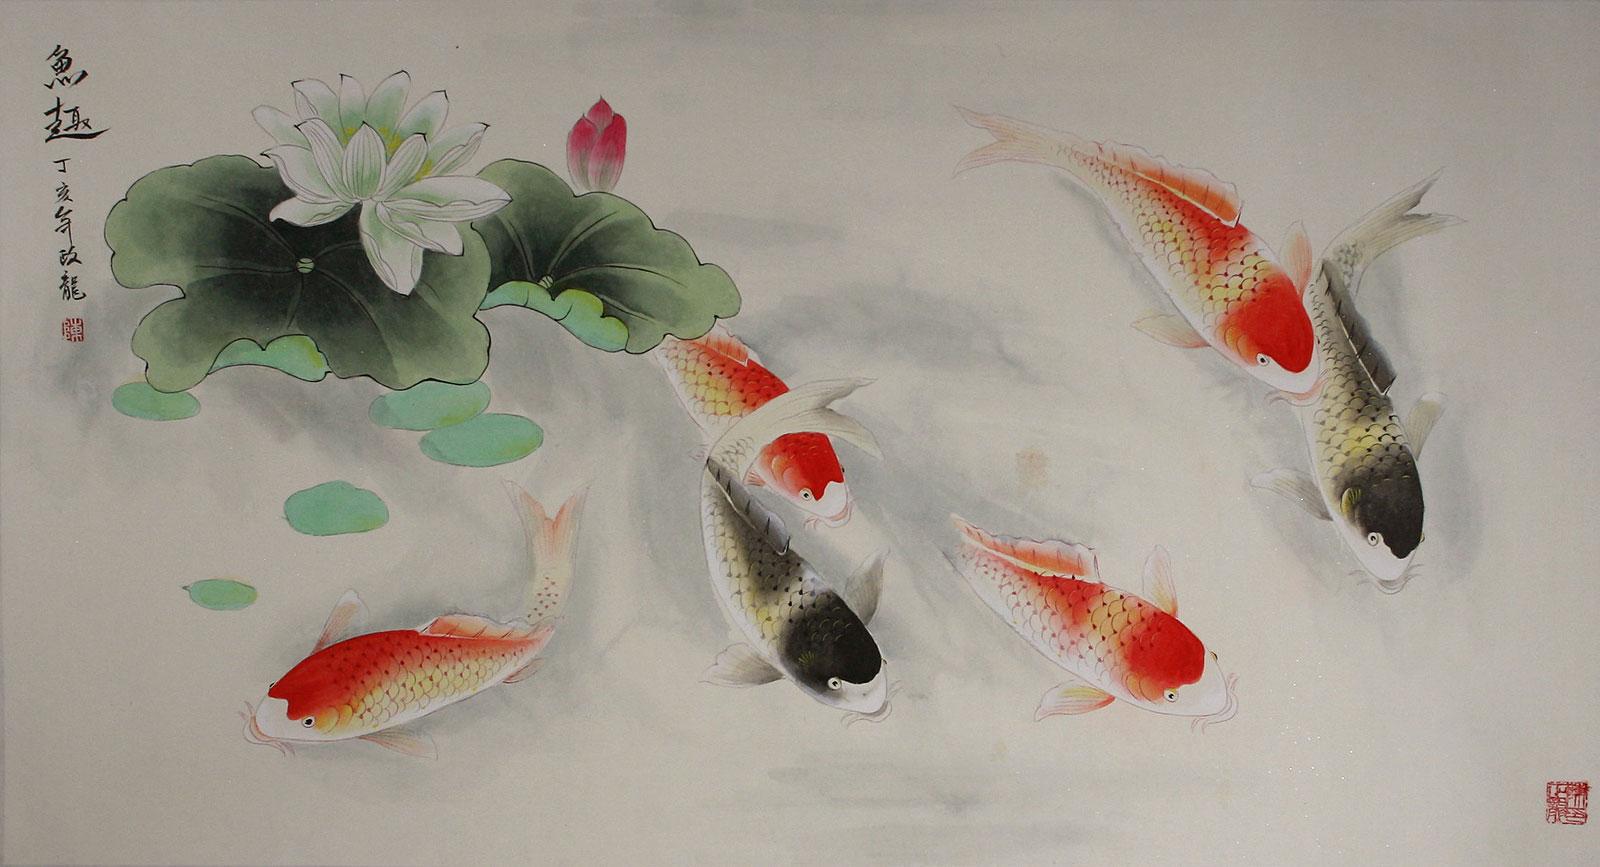 Chinese koi fish watercolor painting asian koi fish for Chinese art koi fish